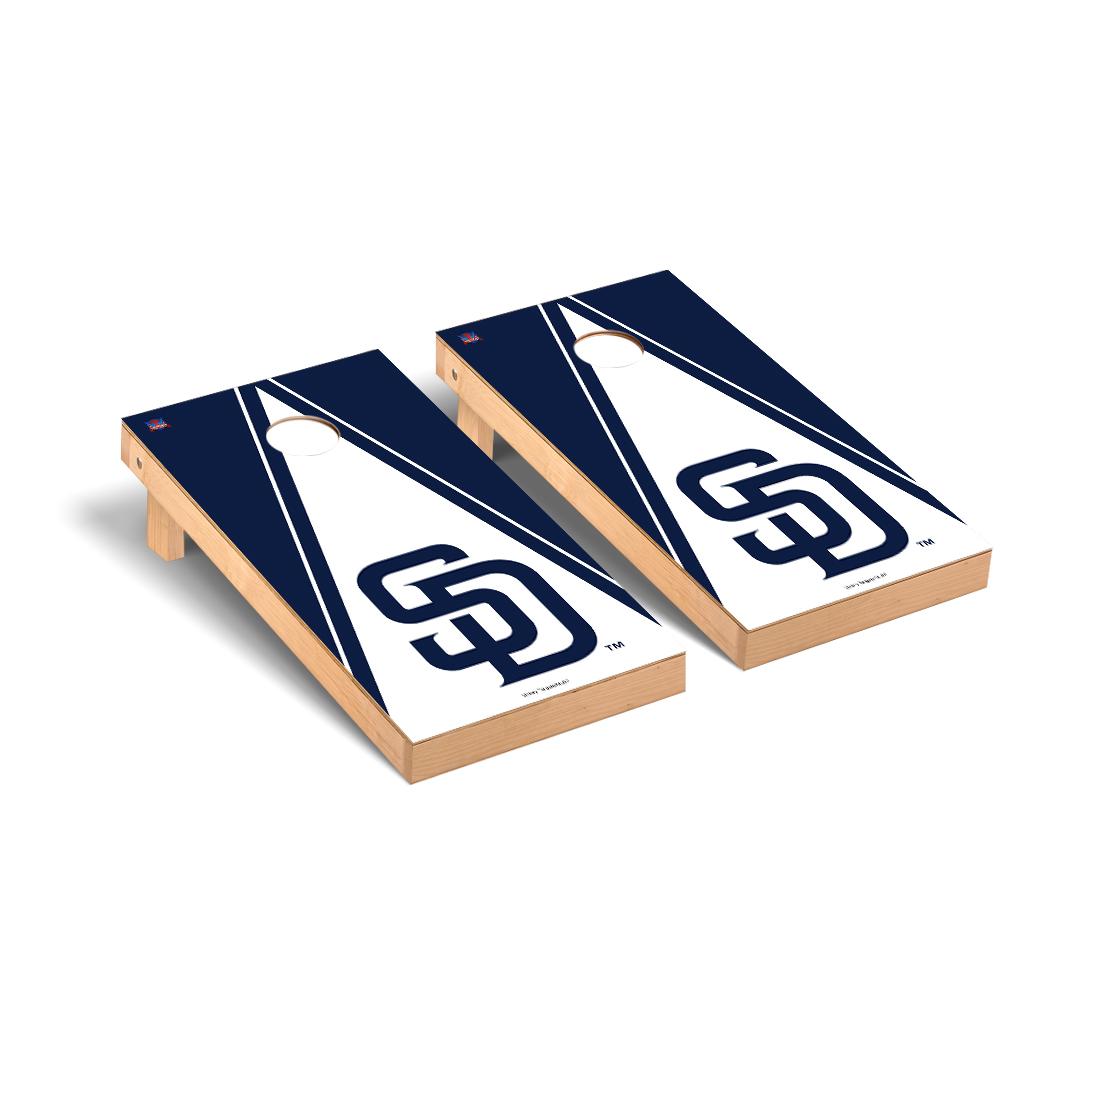 San Diego Padres MLB Baseball Cornhole Game Set Triangle Version